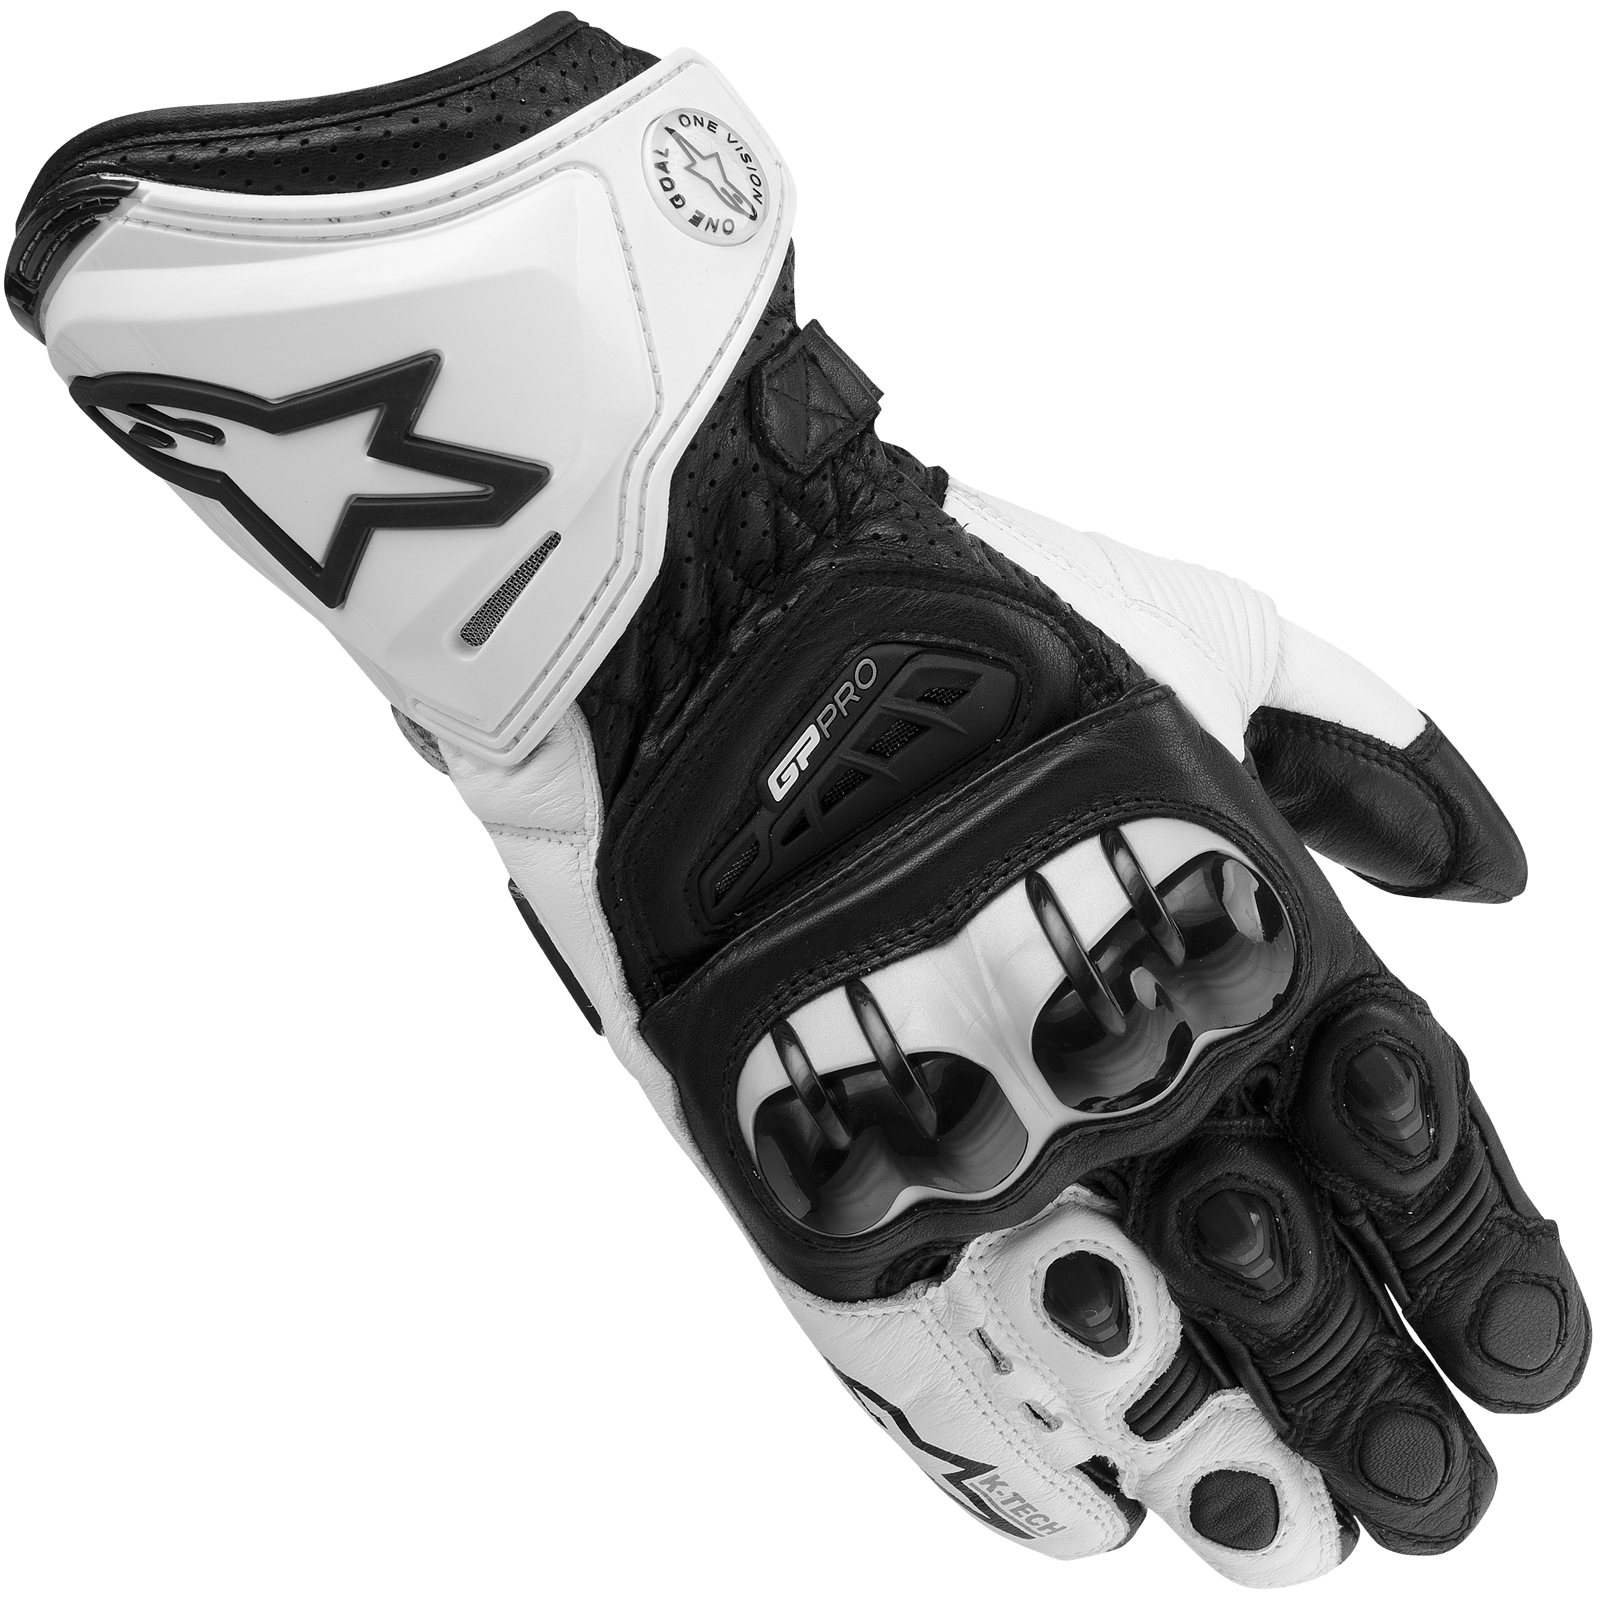 Alpinestar Motorcycle Gloves >> Alpinestars Gp Pro Gloves Gloves Mince His Words